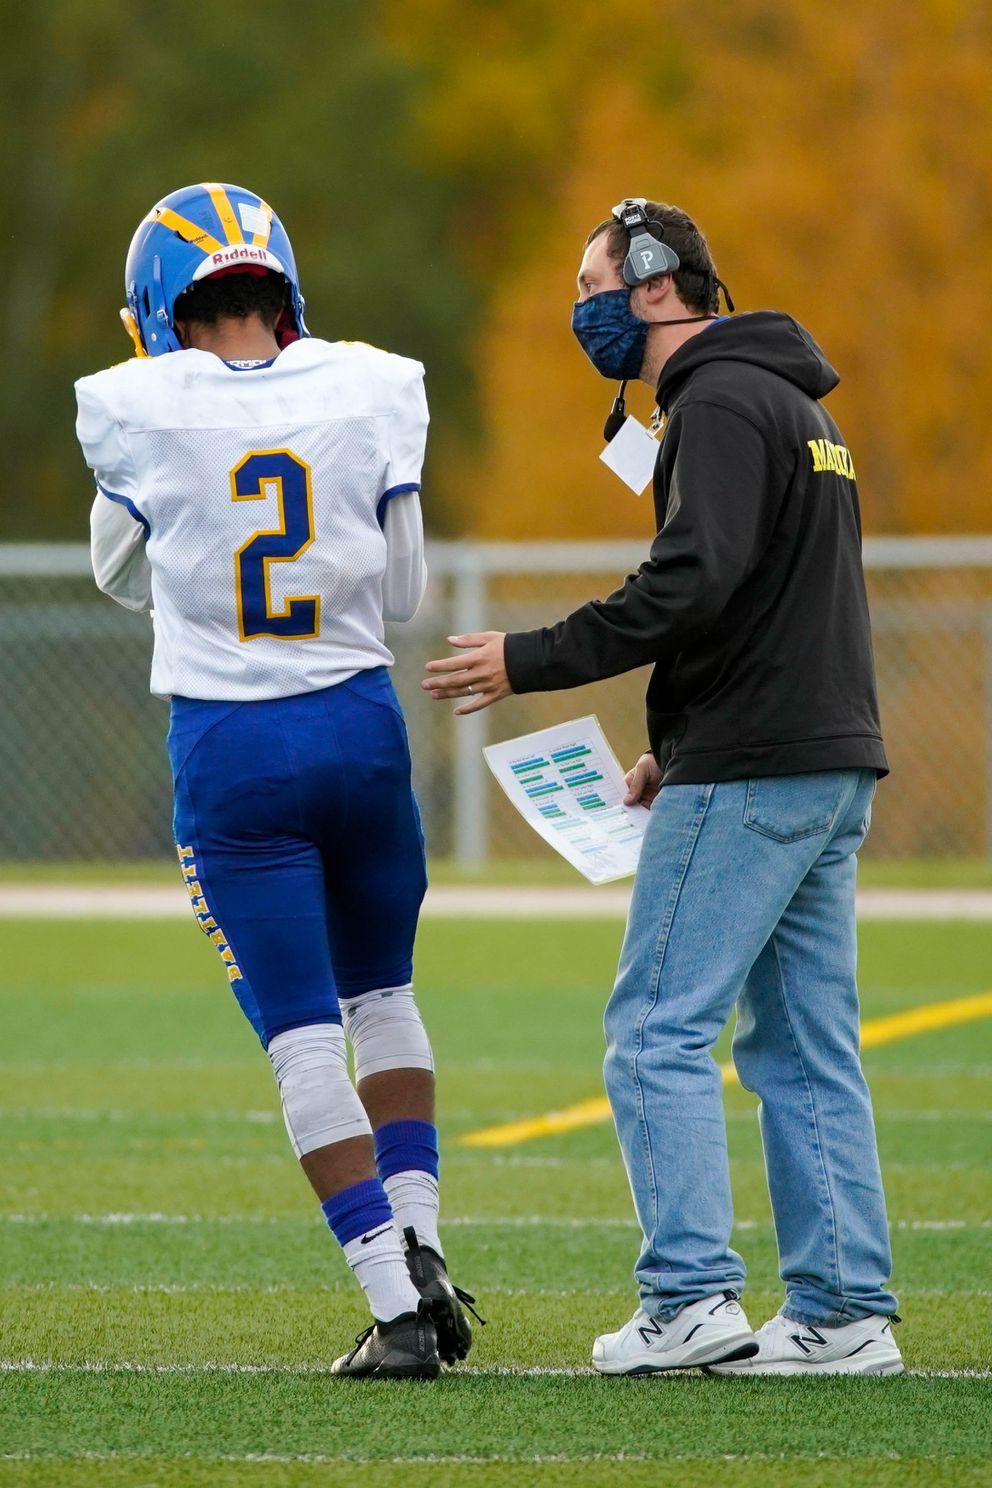 Chance Matsuoka talks with quarterback Reason Timberlake during a game against the East Thunderbirds. (Loren Holmes / ADN)